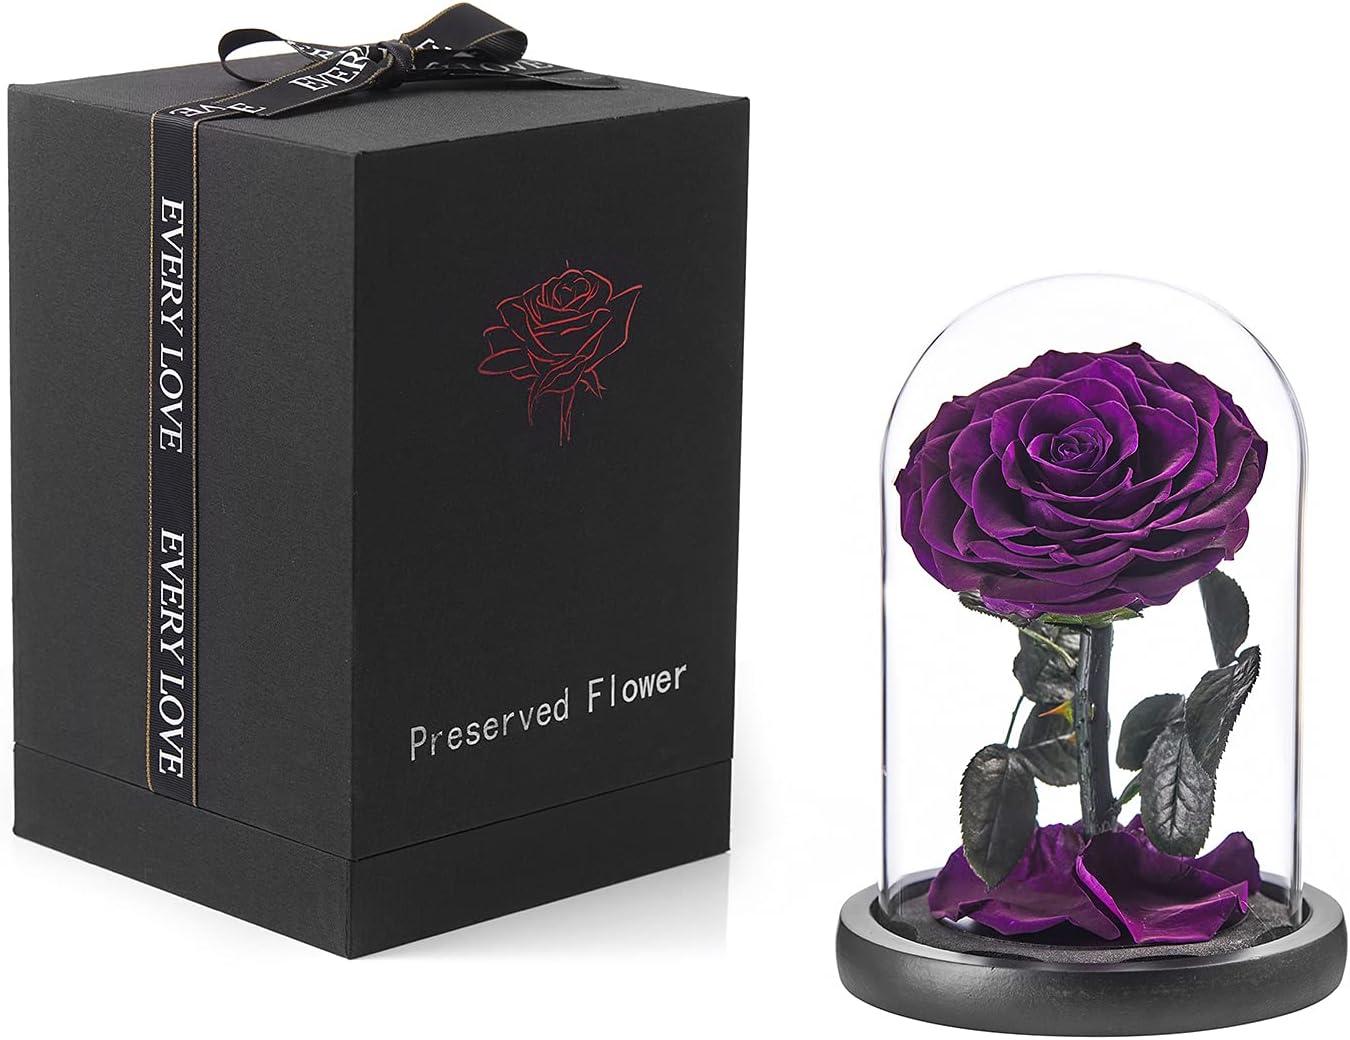 Eterfield Preserved Real Rose Handmade Doo Wholesale in Glass Arlington Mall Eternal